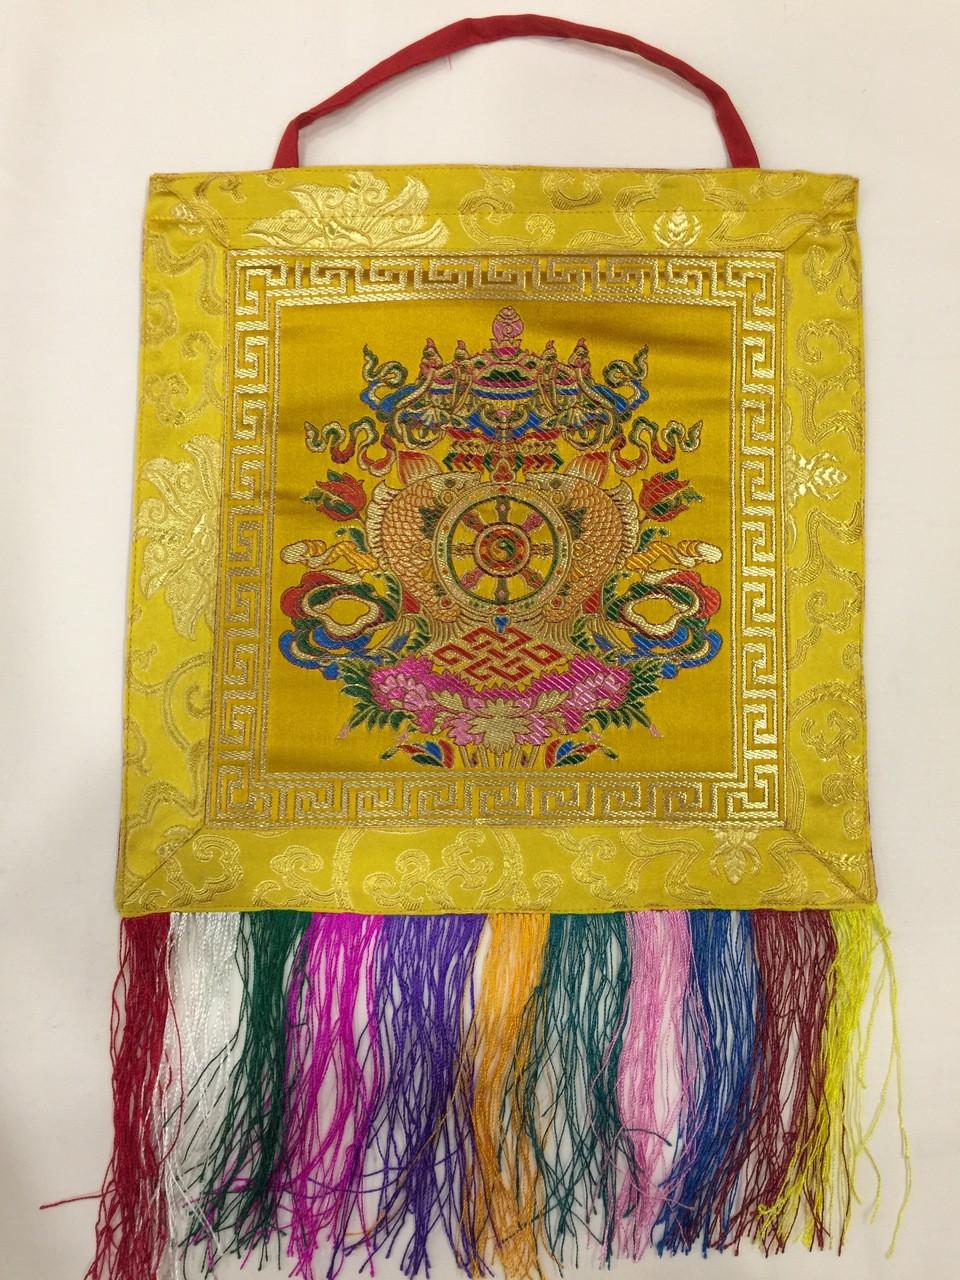 Tibetan buddhist yelllow 8 auspicious symbol wall hanging / banner ...